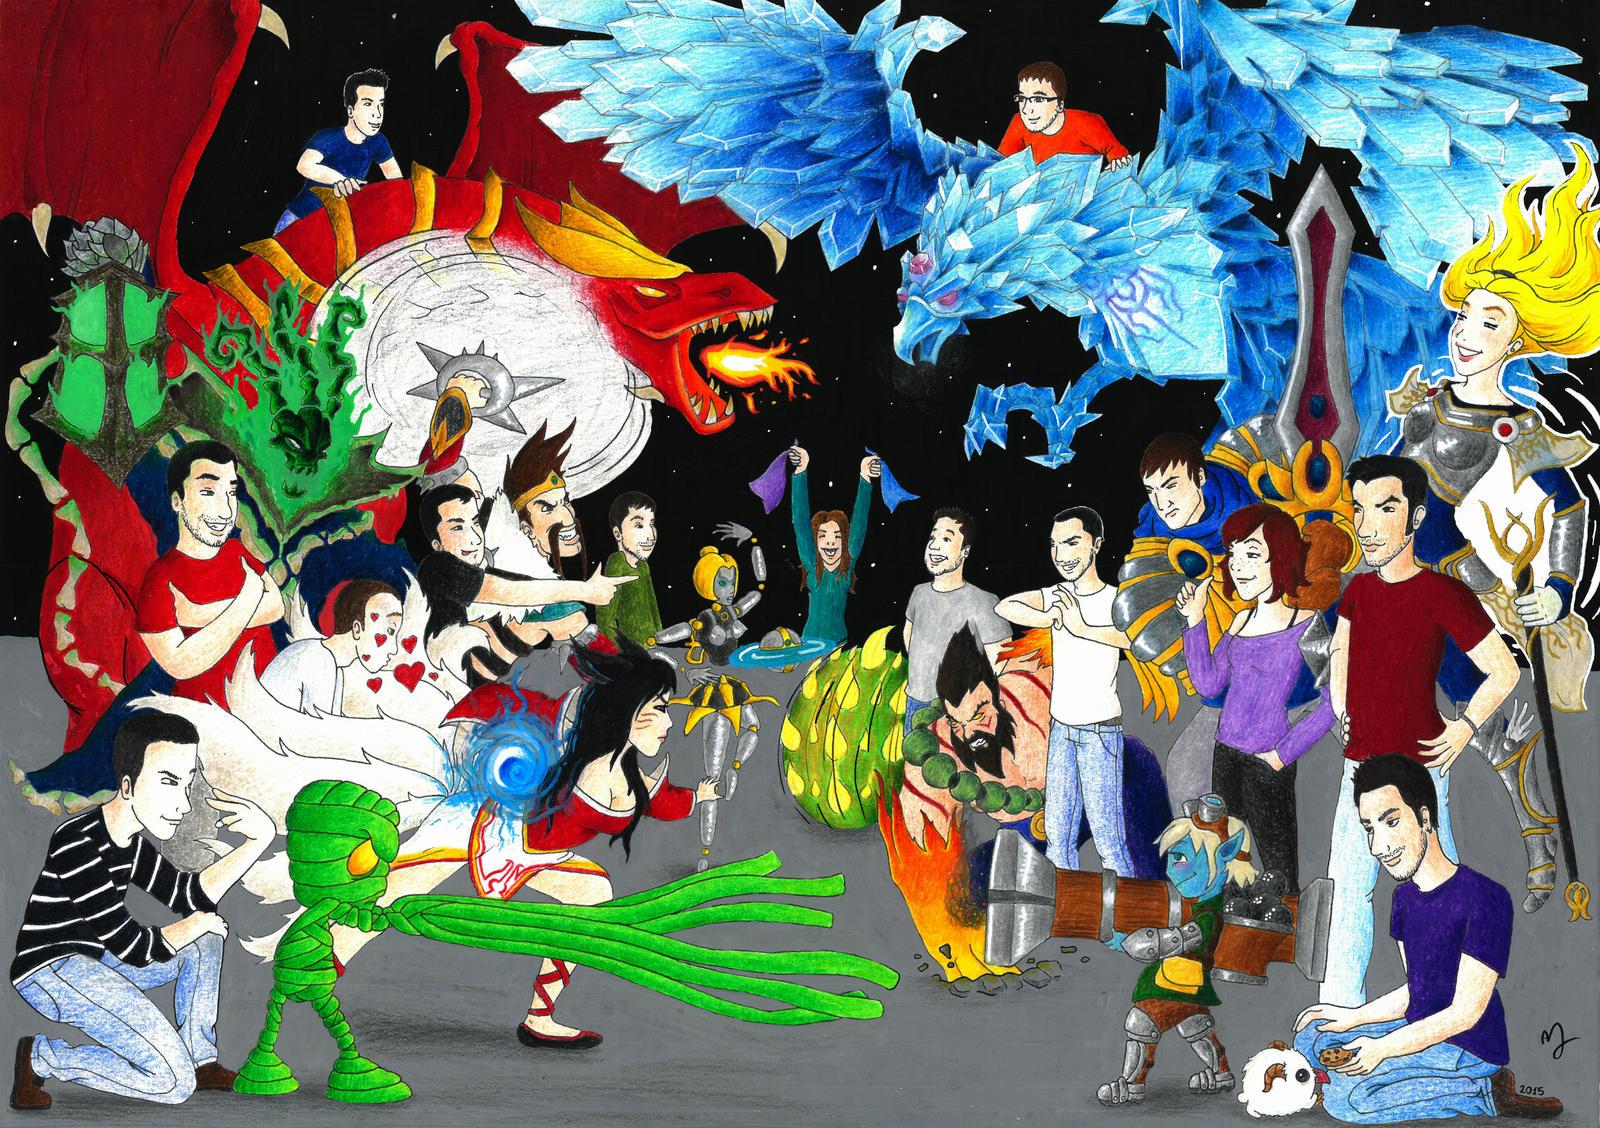 League of Legends friends battle by Yalshid